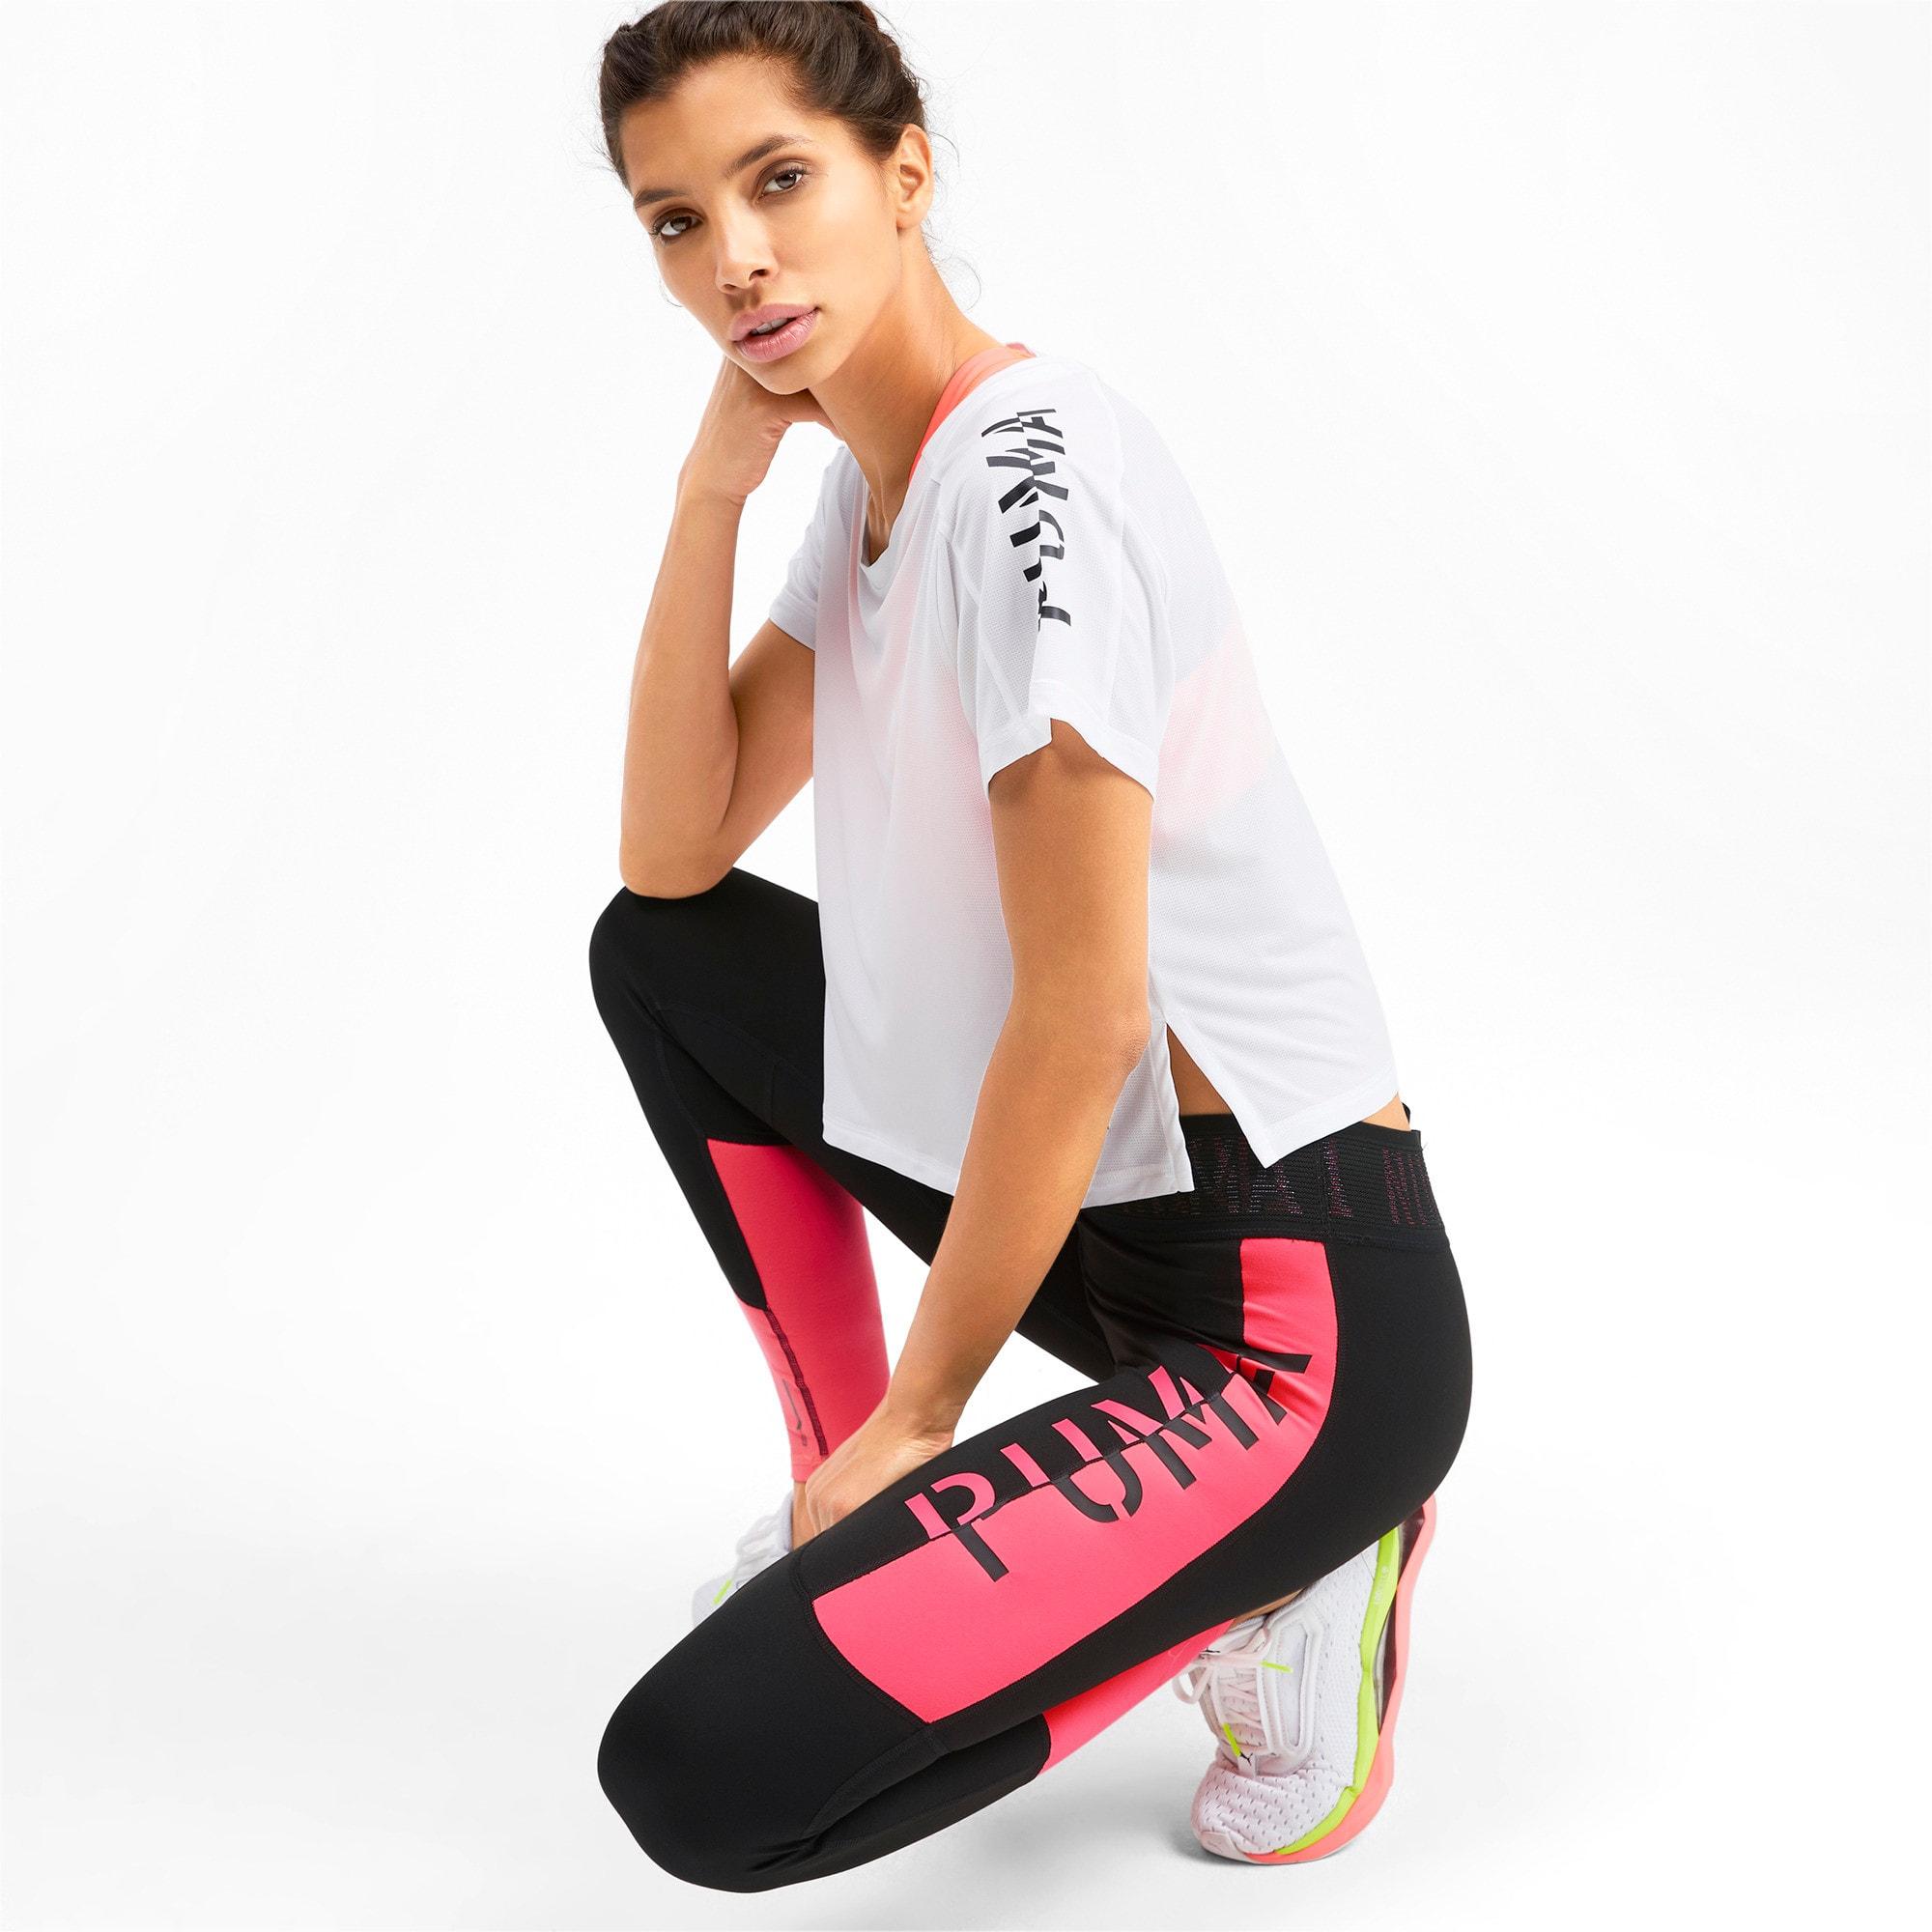 Thumbnail 3 of ADHM 2019 Logo 7/8 Women's Training Leggings, Puma Black-Pink Alert, medium-IND